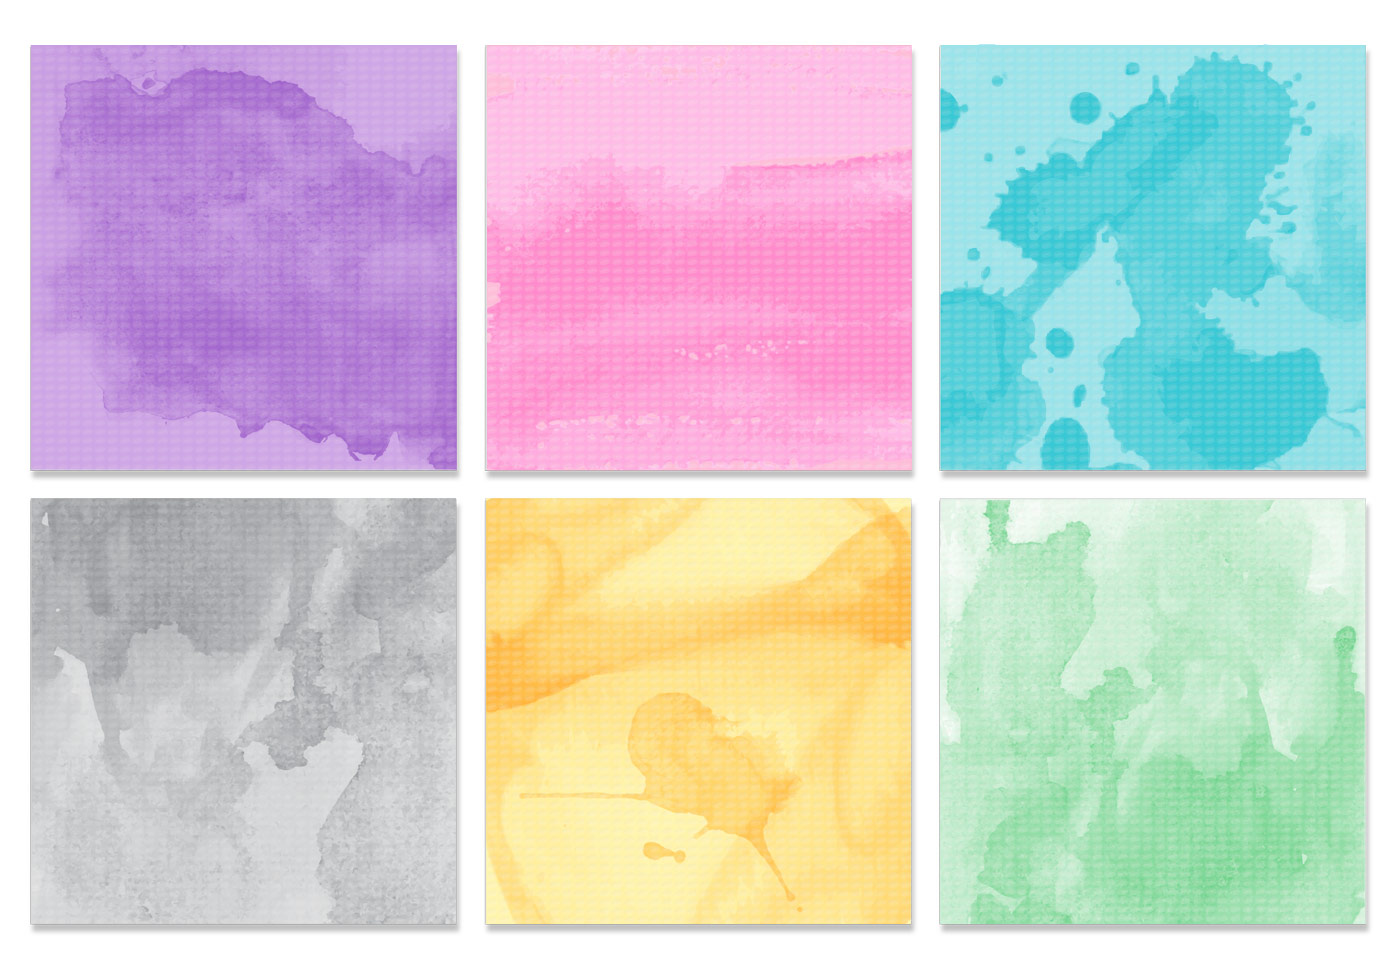 Watercolor Texture Vector Pack - Download Free Vectors ...